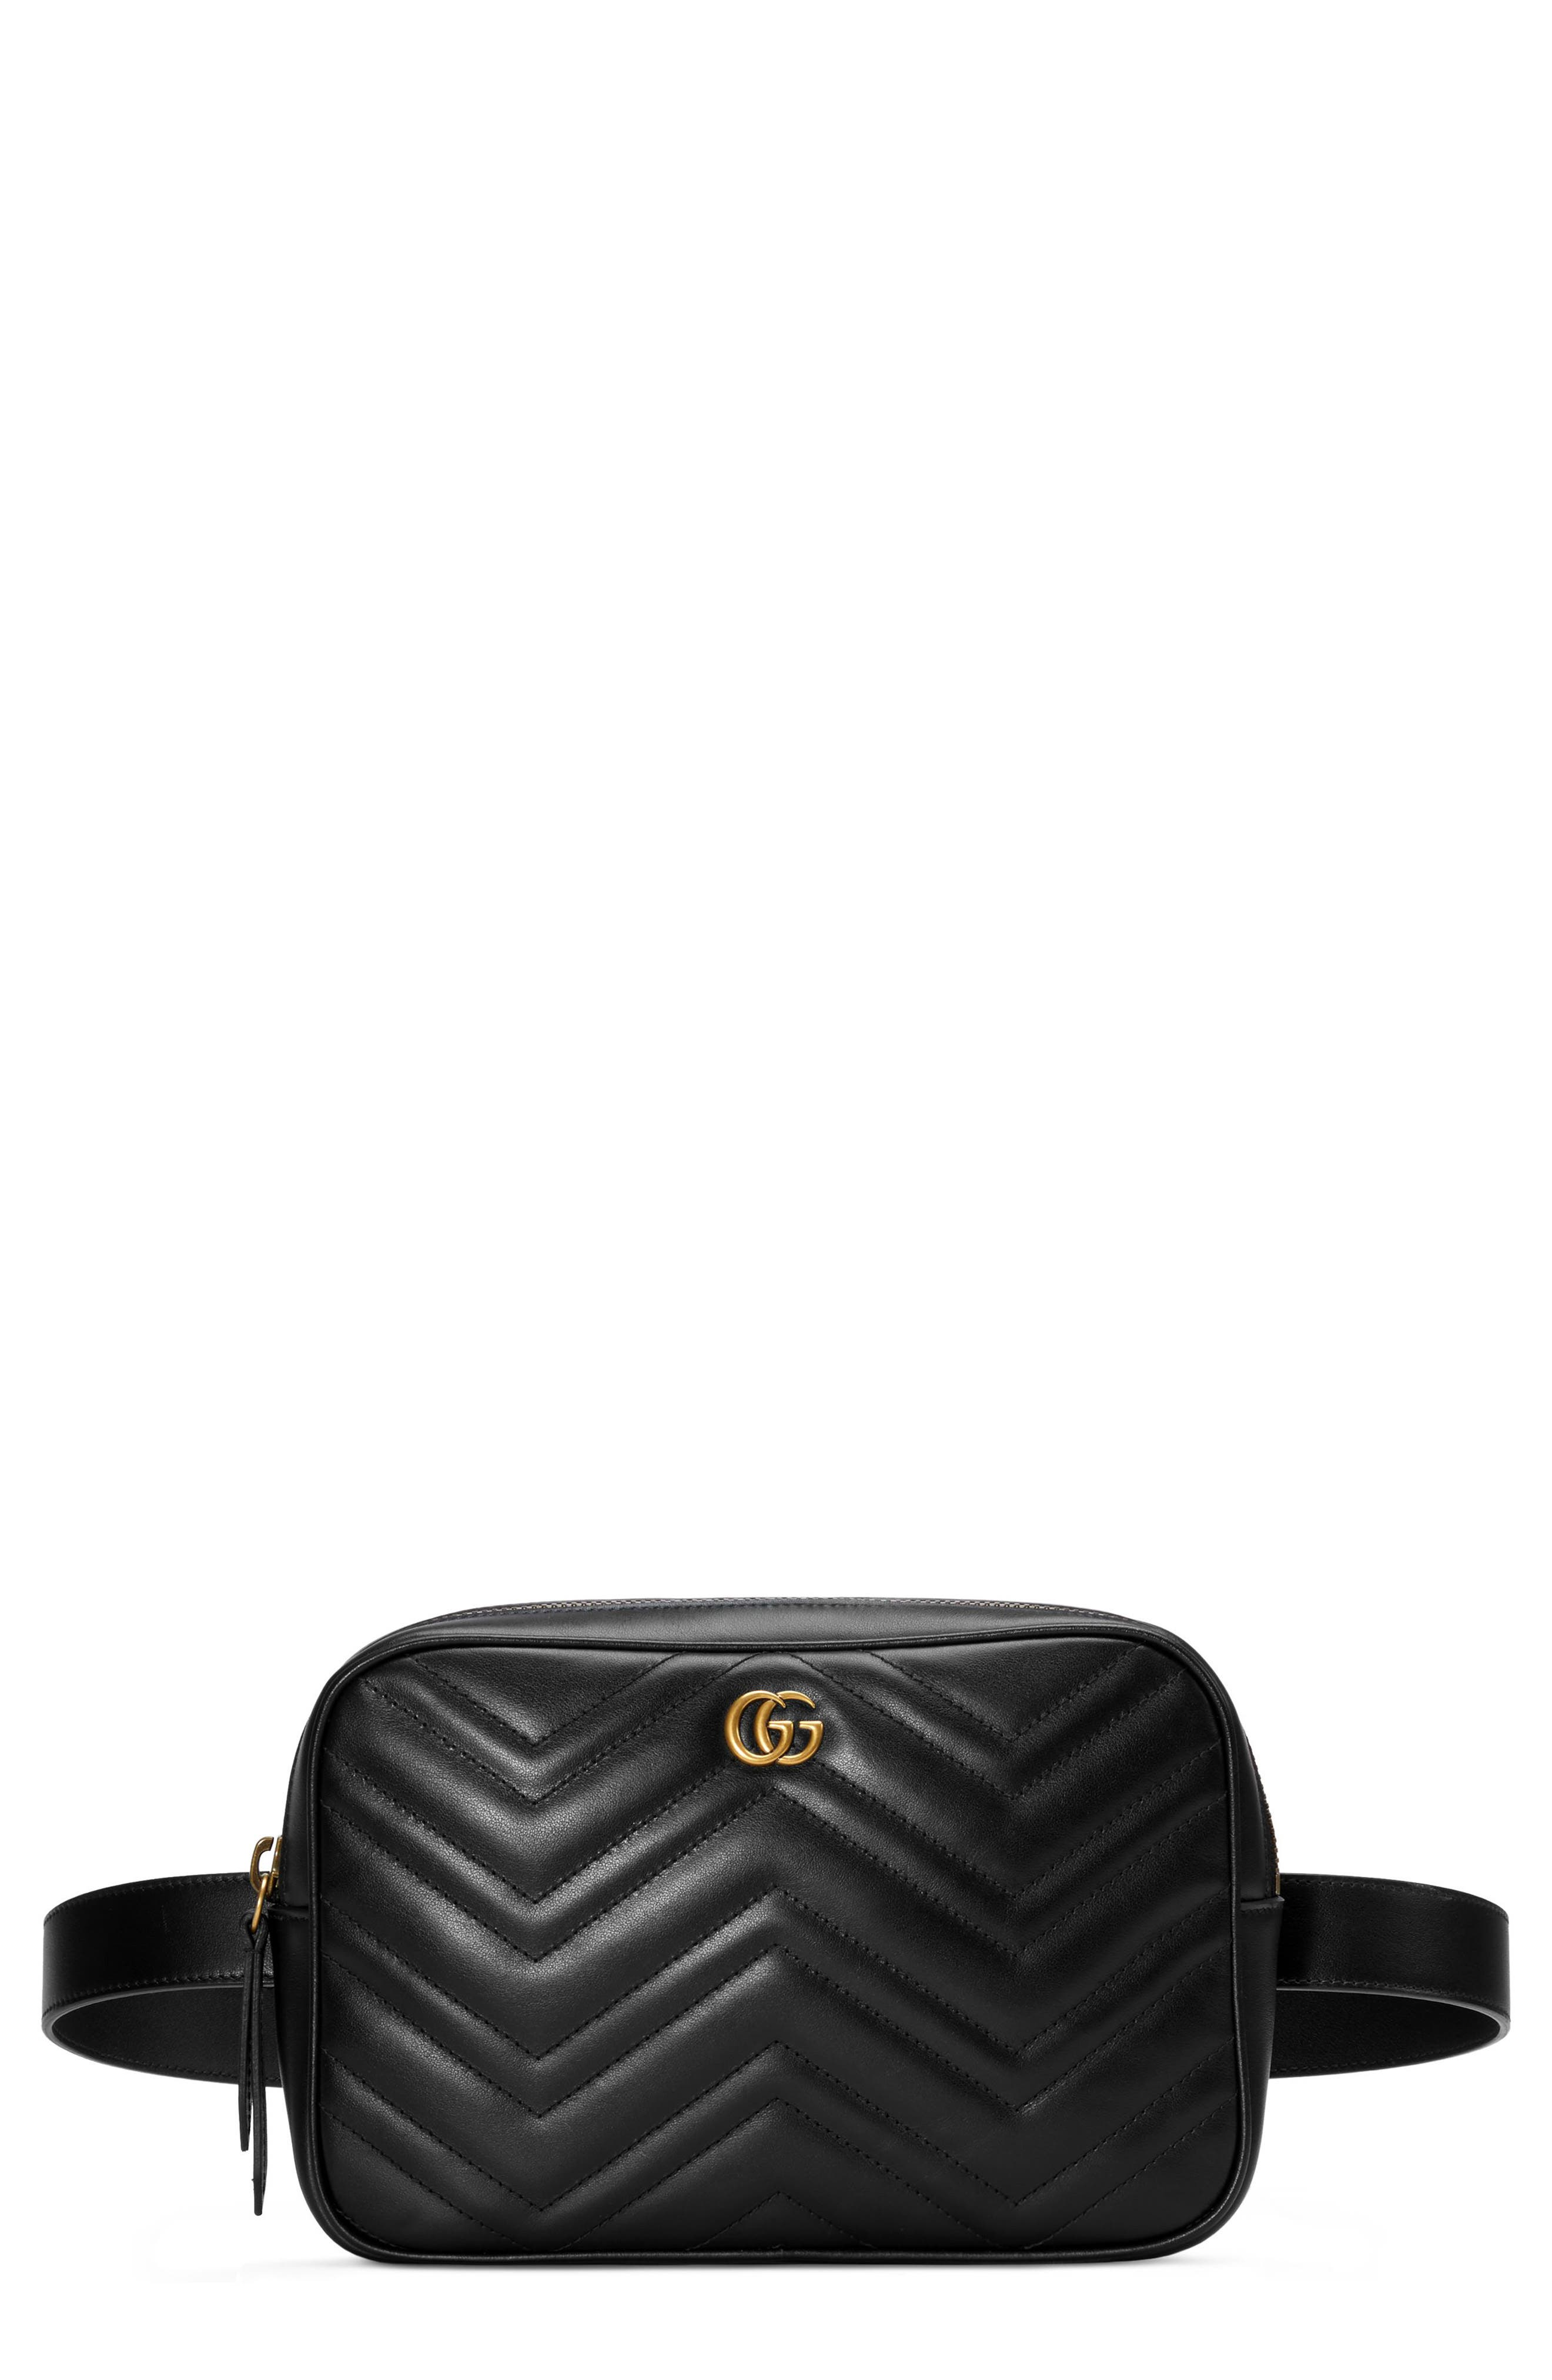 6b6c7eb0ac0c Gucci Gg Marmont 2.0 Matelasse Convertible Leather Belt Bag - Black